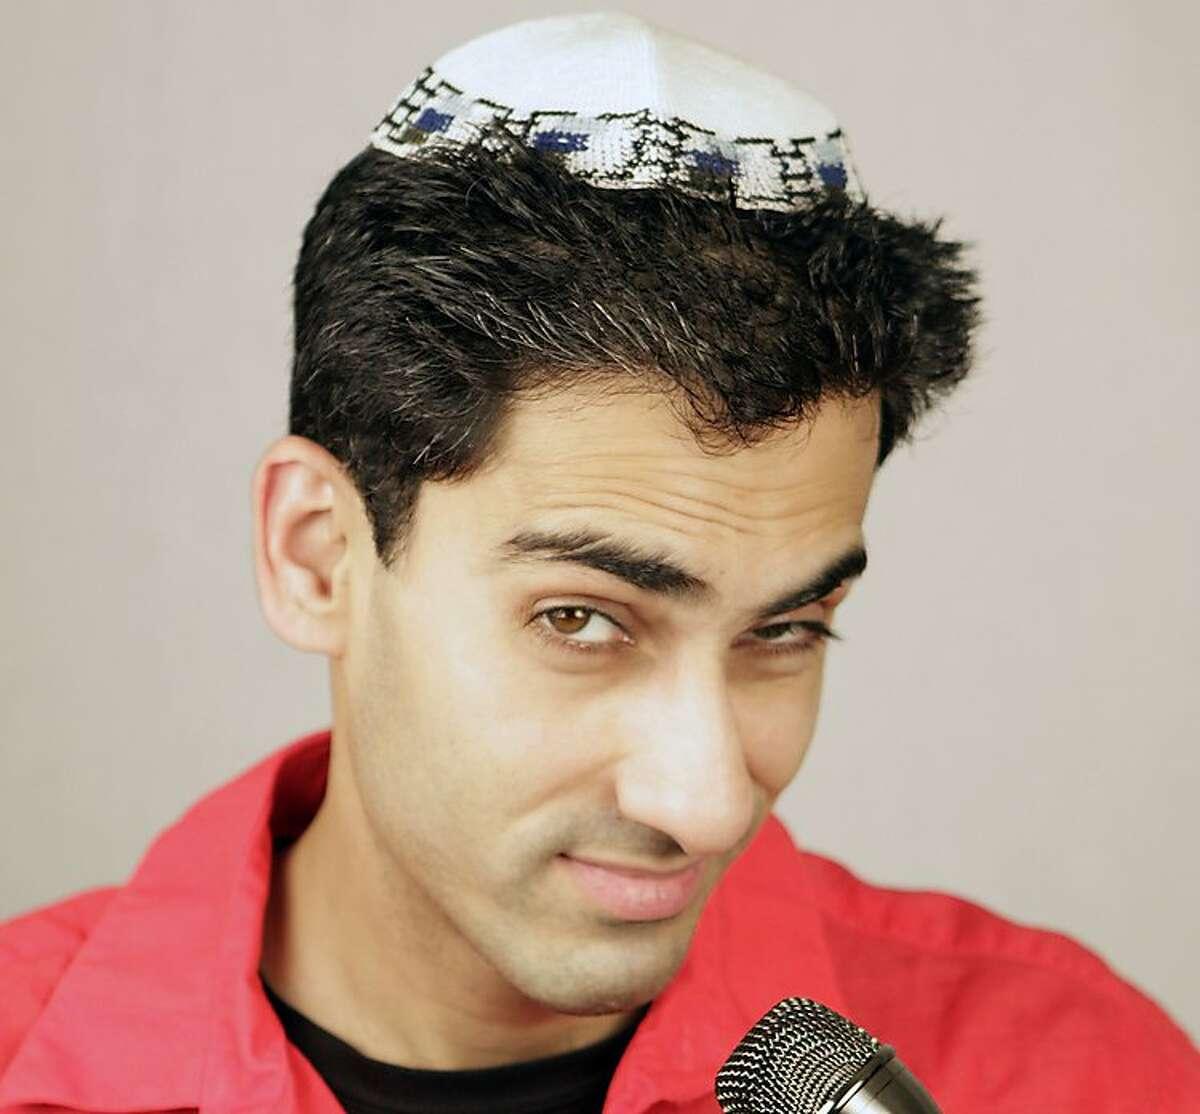 Samson Koletkar is a co-founder of the Desi Comedy Fest.